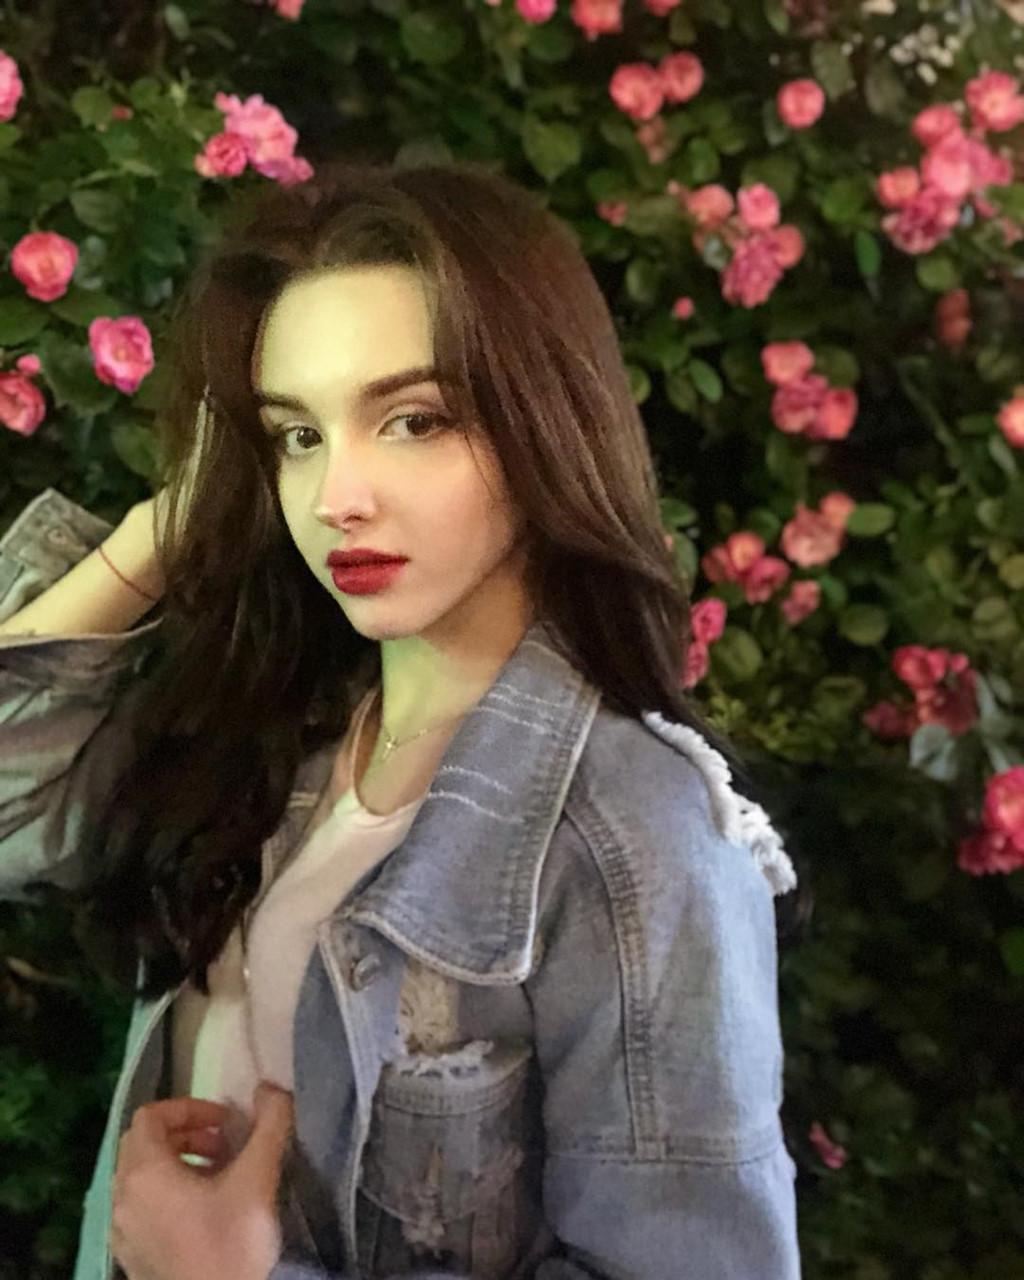 hot-girl-Karimova-Elina-dao-tung-chao-gioi-tre-vi-qua-xinh-dep (2)